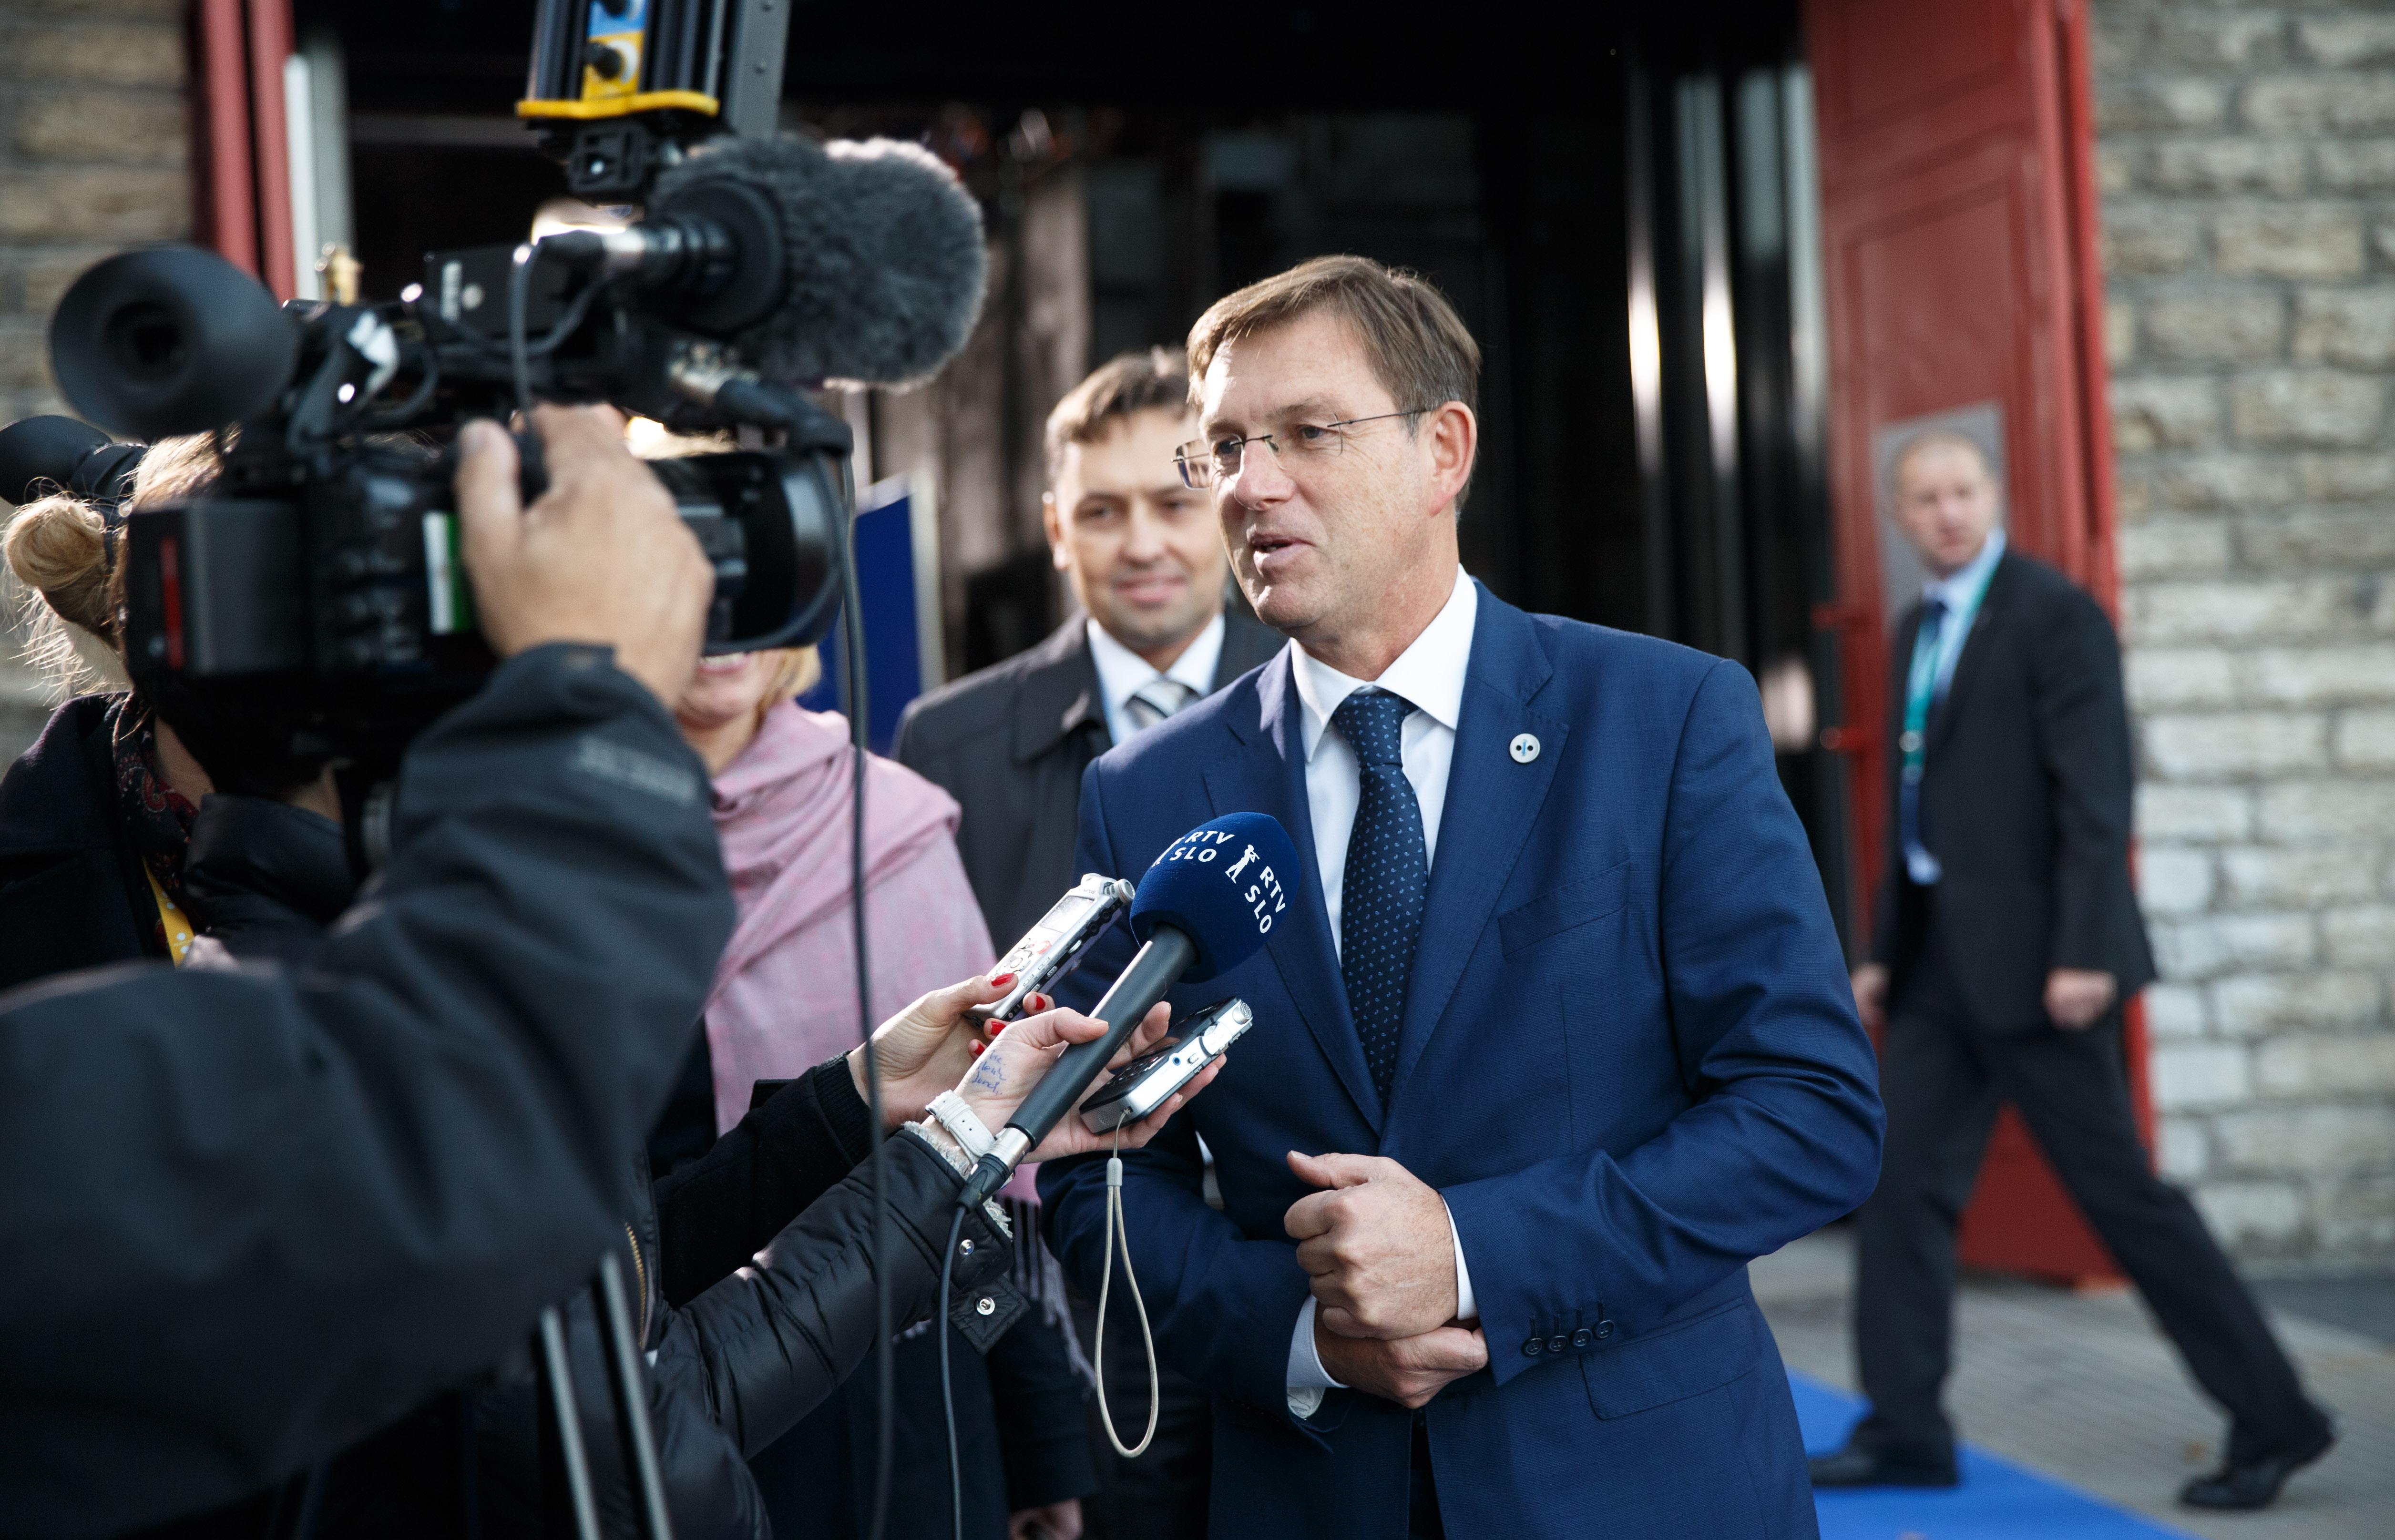 Exit doorstep and member statesu0027 press conferences Miro Cerar  sc 1 st  Wikimedia Commons & File:Tallinn Digital Summit. Exit doorstep and member statesu0027 press ...